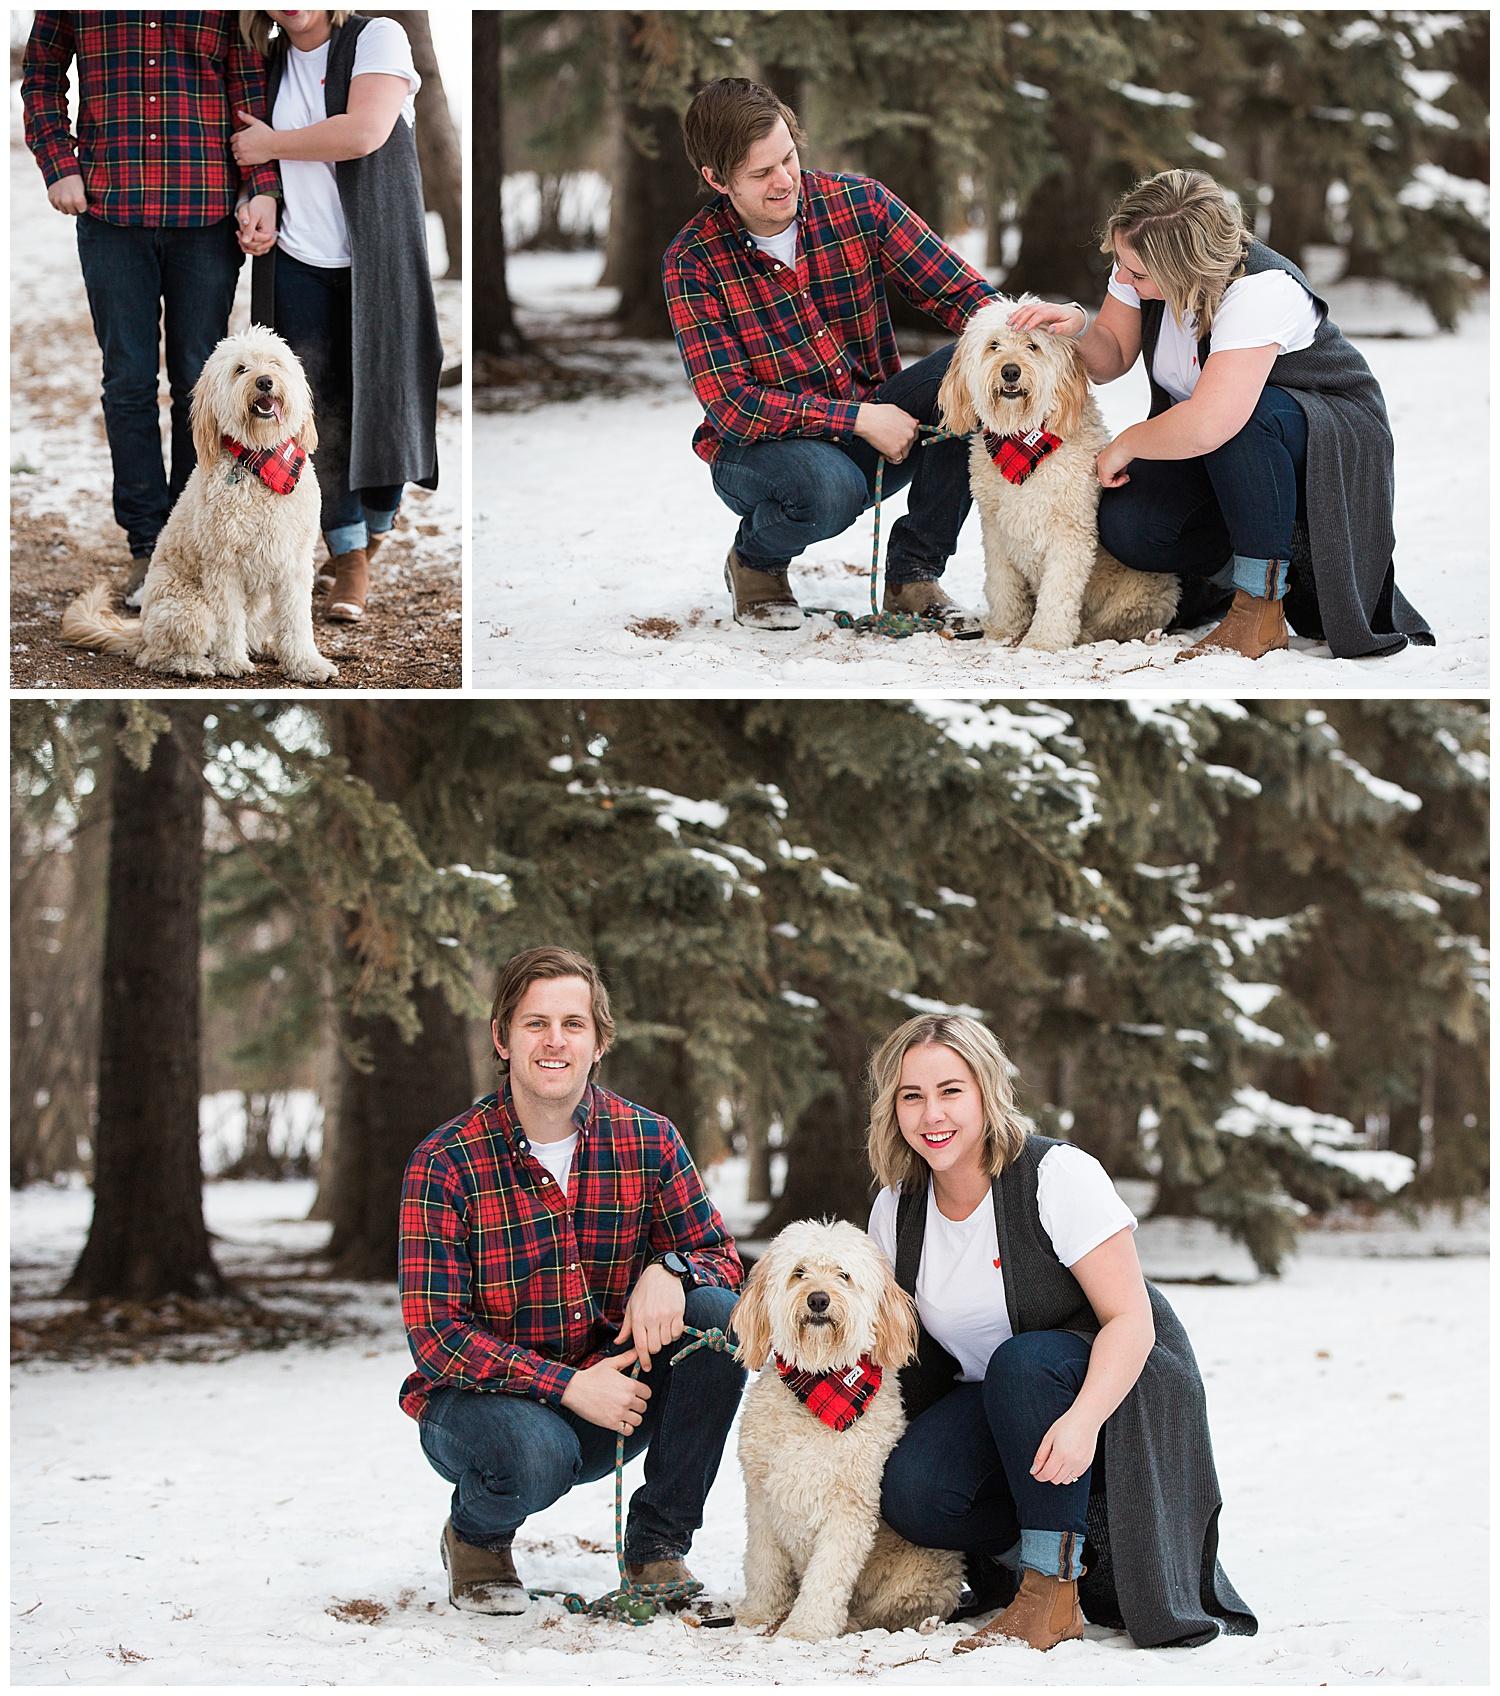 calgary-engagement-dog-3.jpg